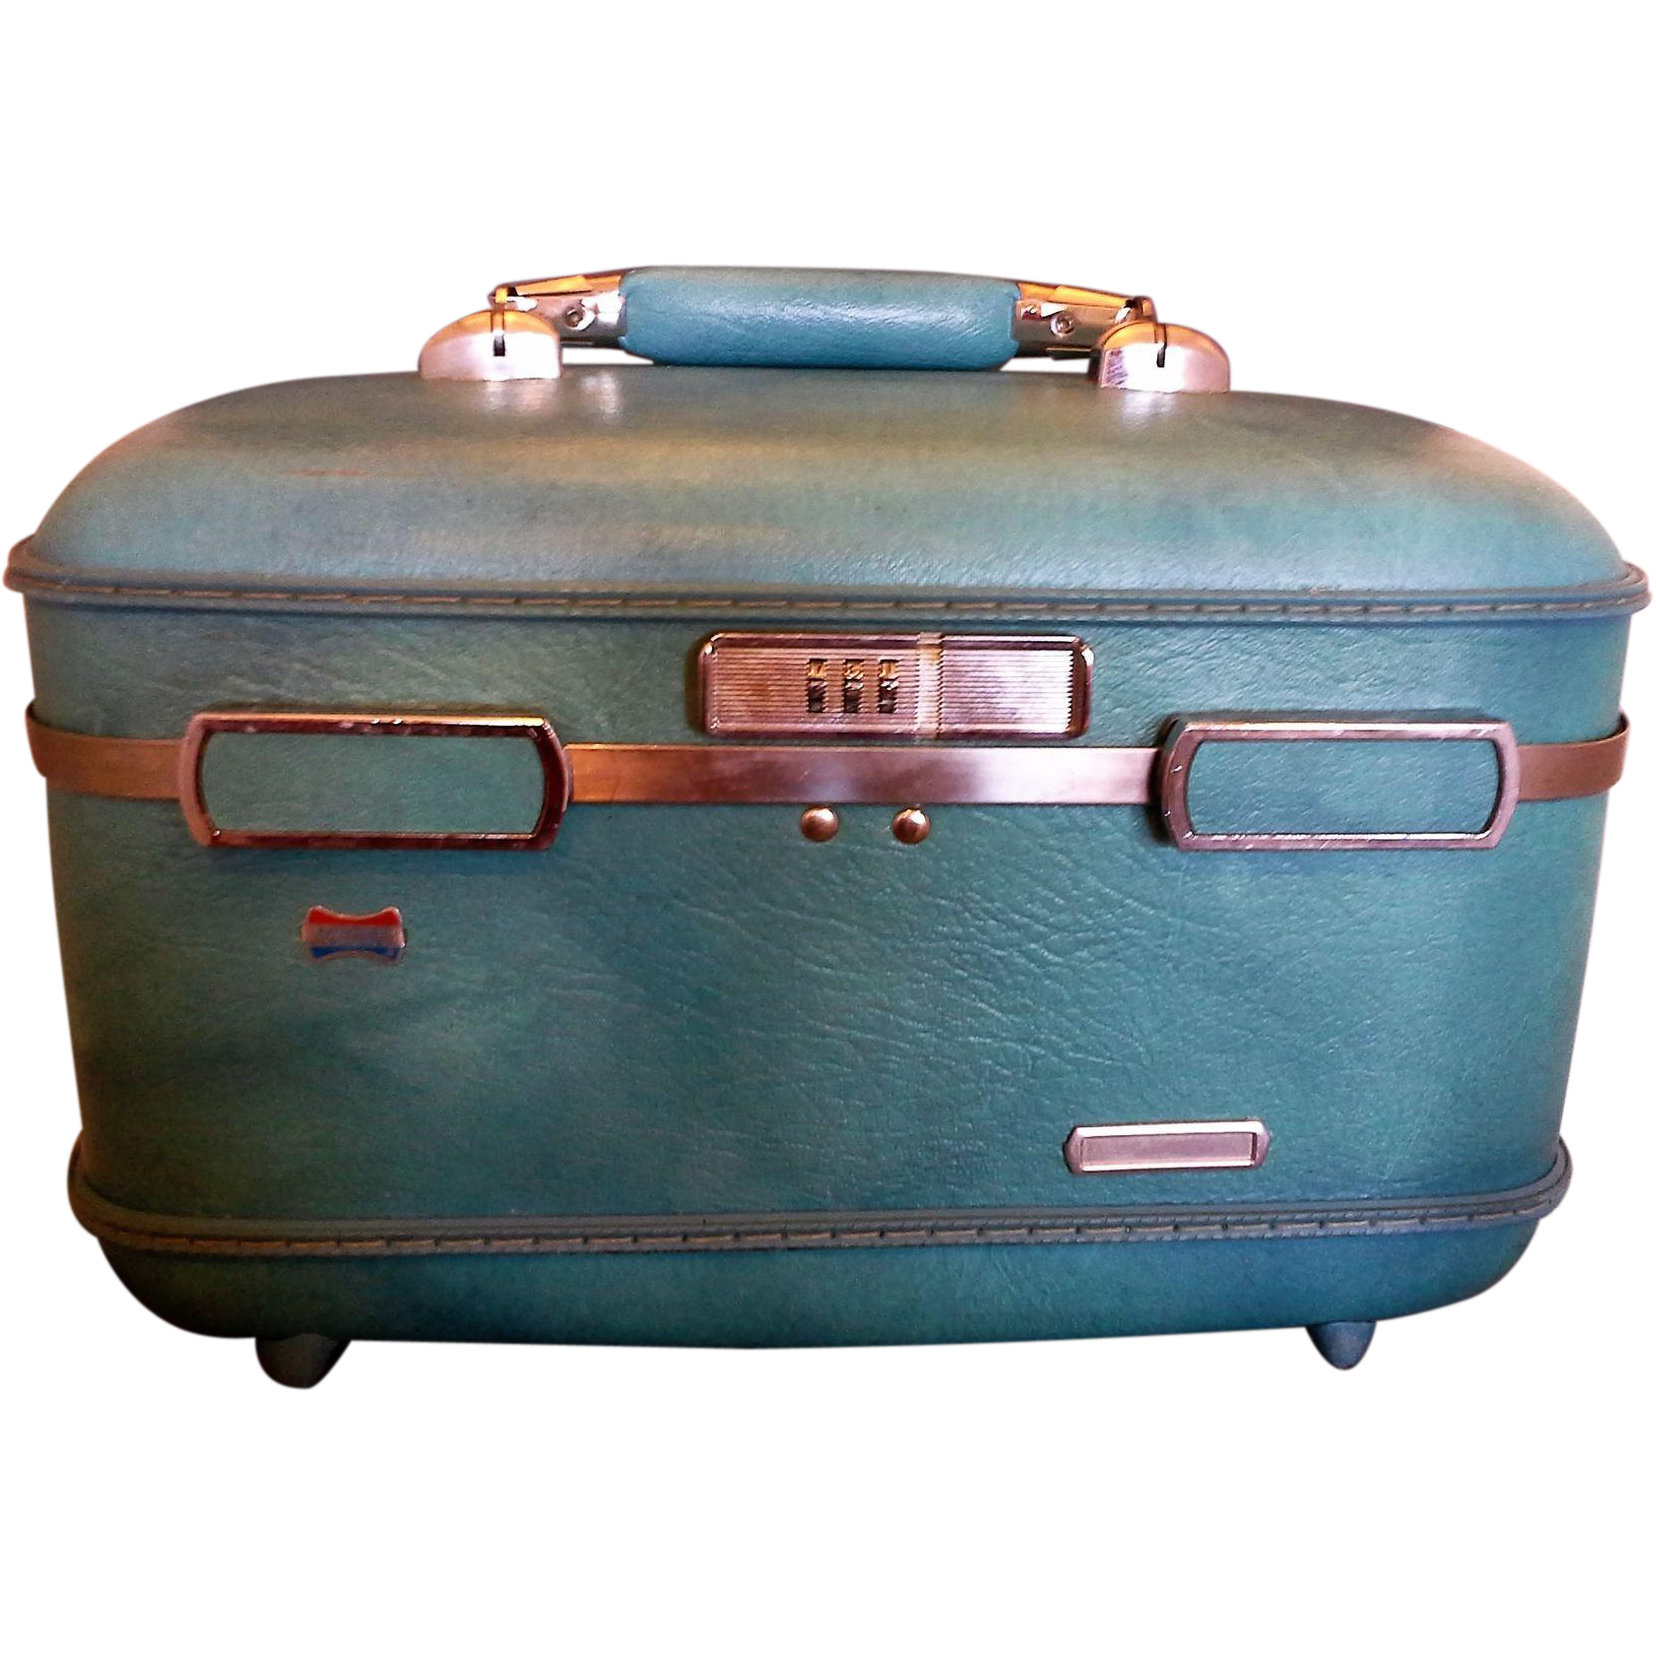 American Tourister Hard Vinyl Turquoise Blue Train Case Suit Case